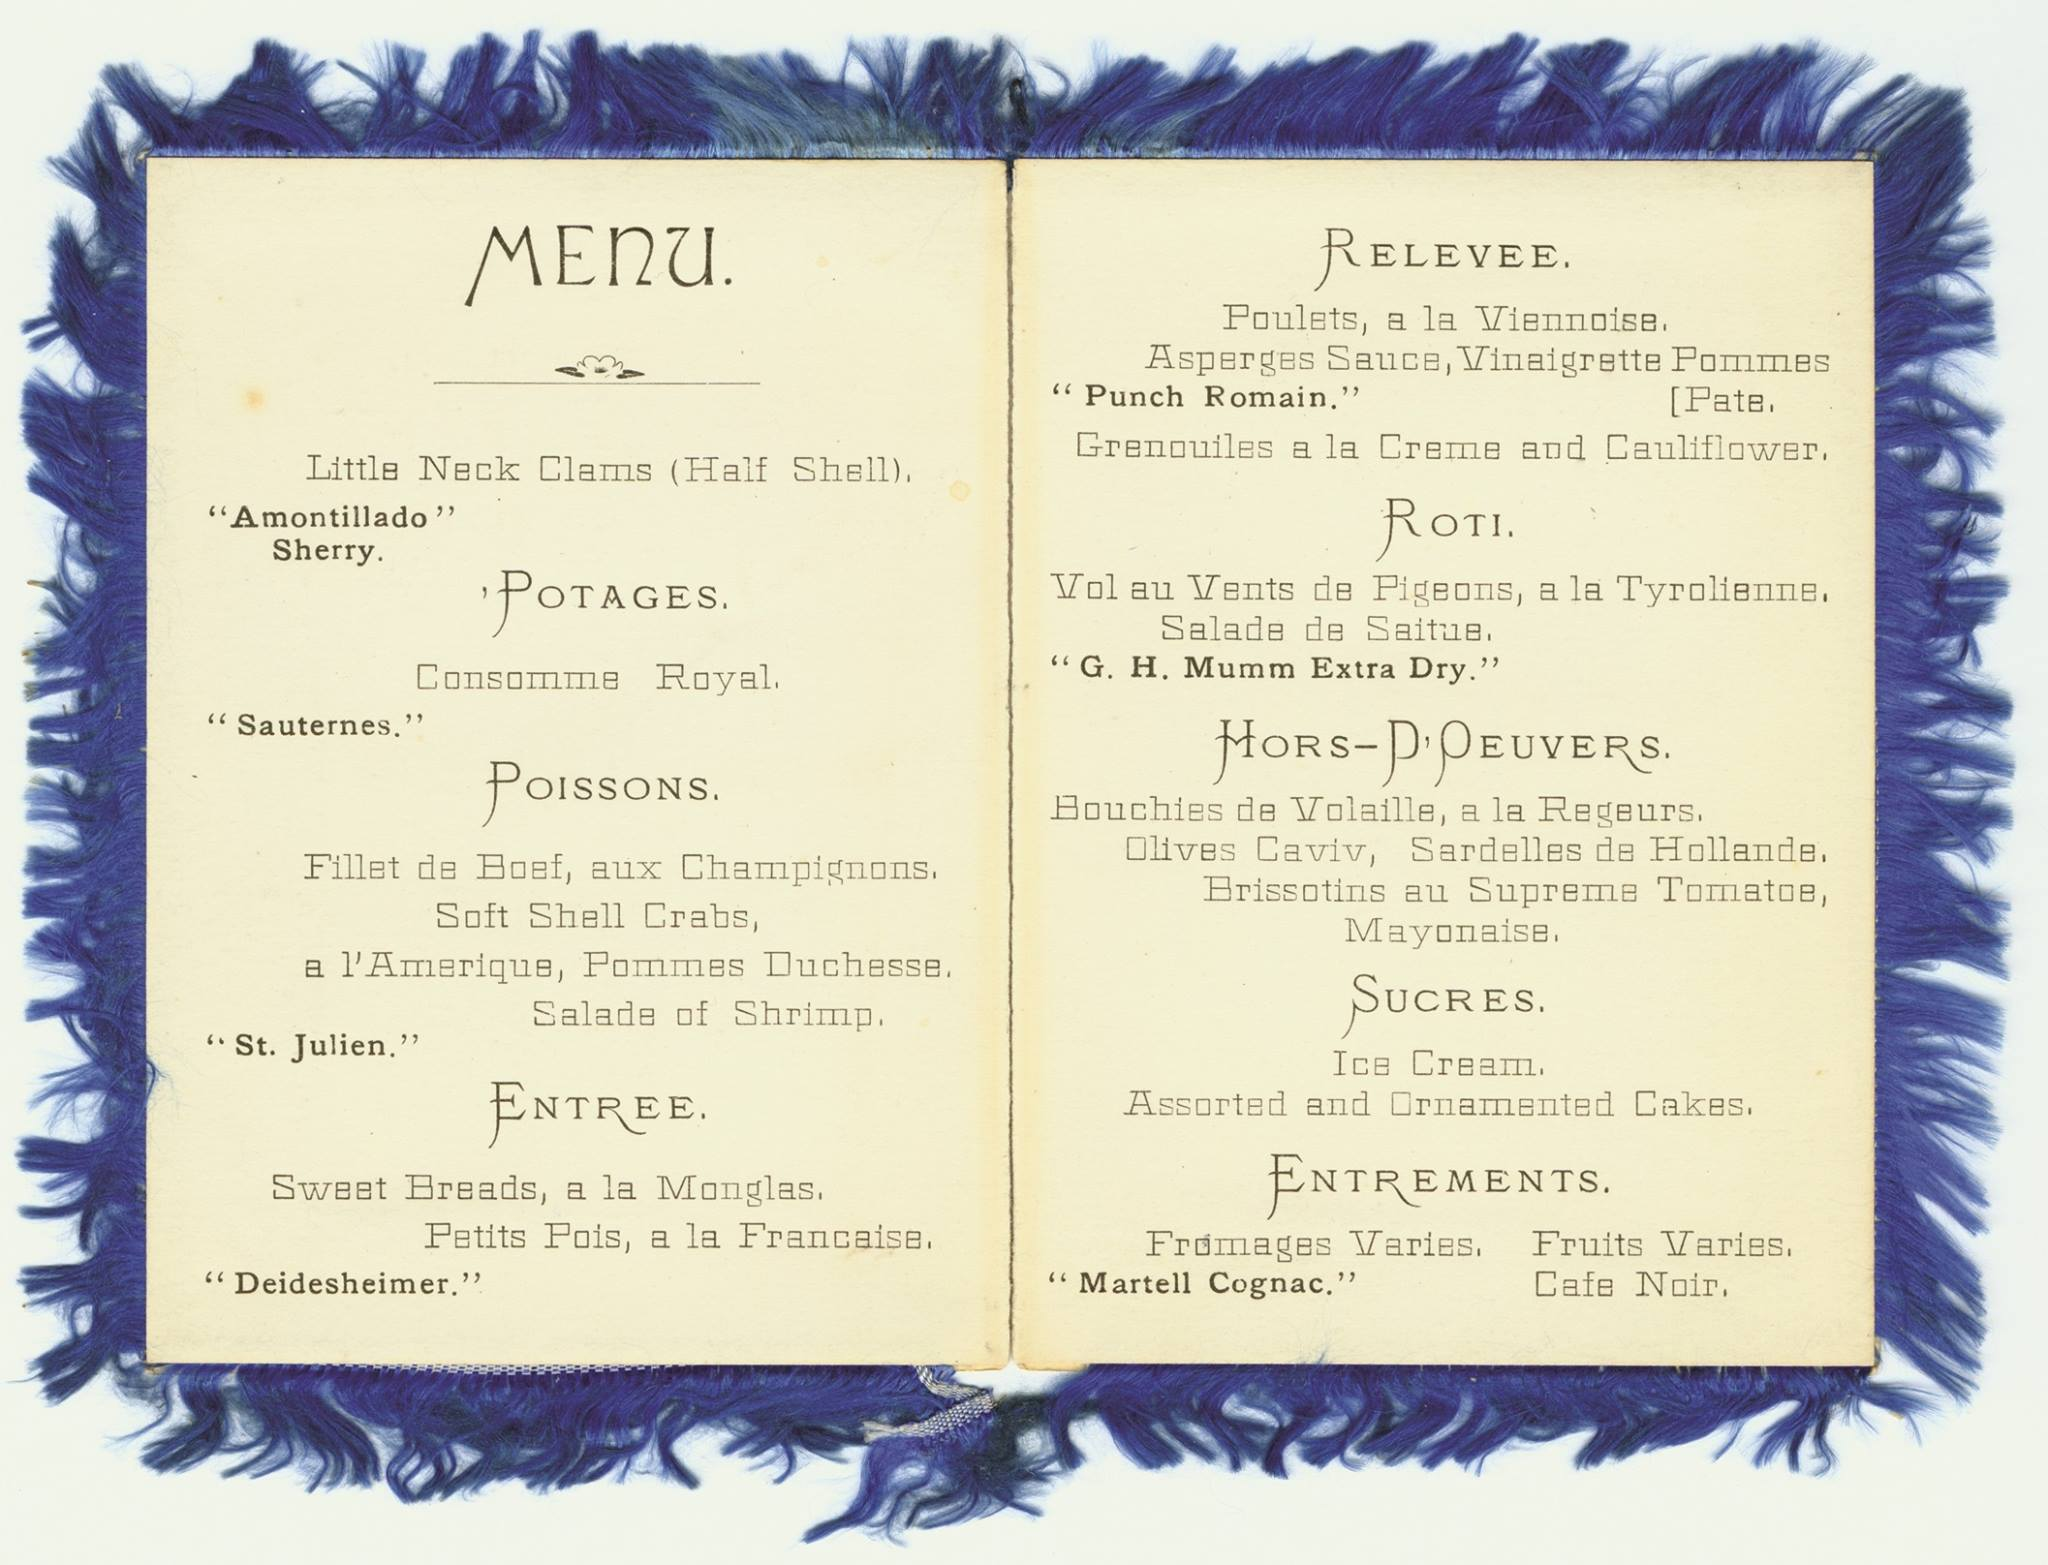 The menu of the original Trefa Banquet (Photo/Courtesy American Jewish Archives)